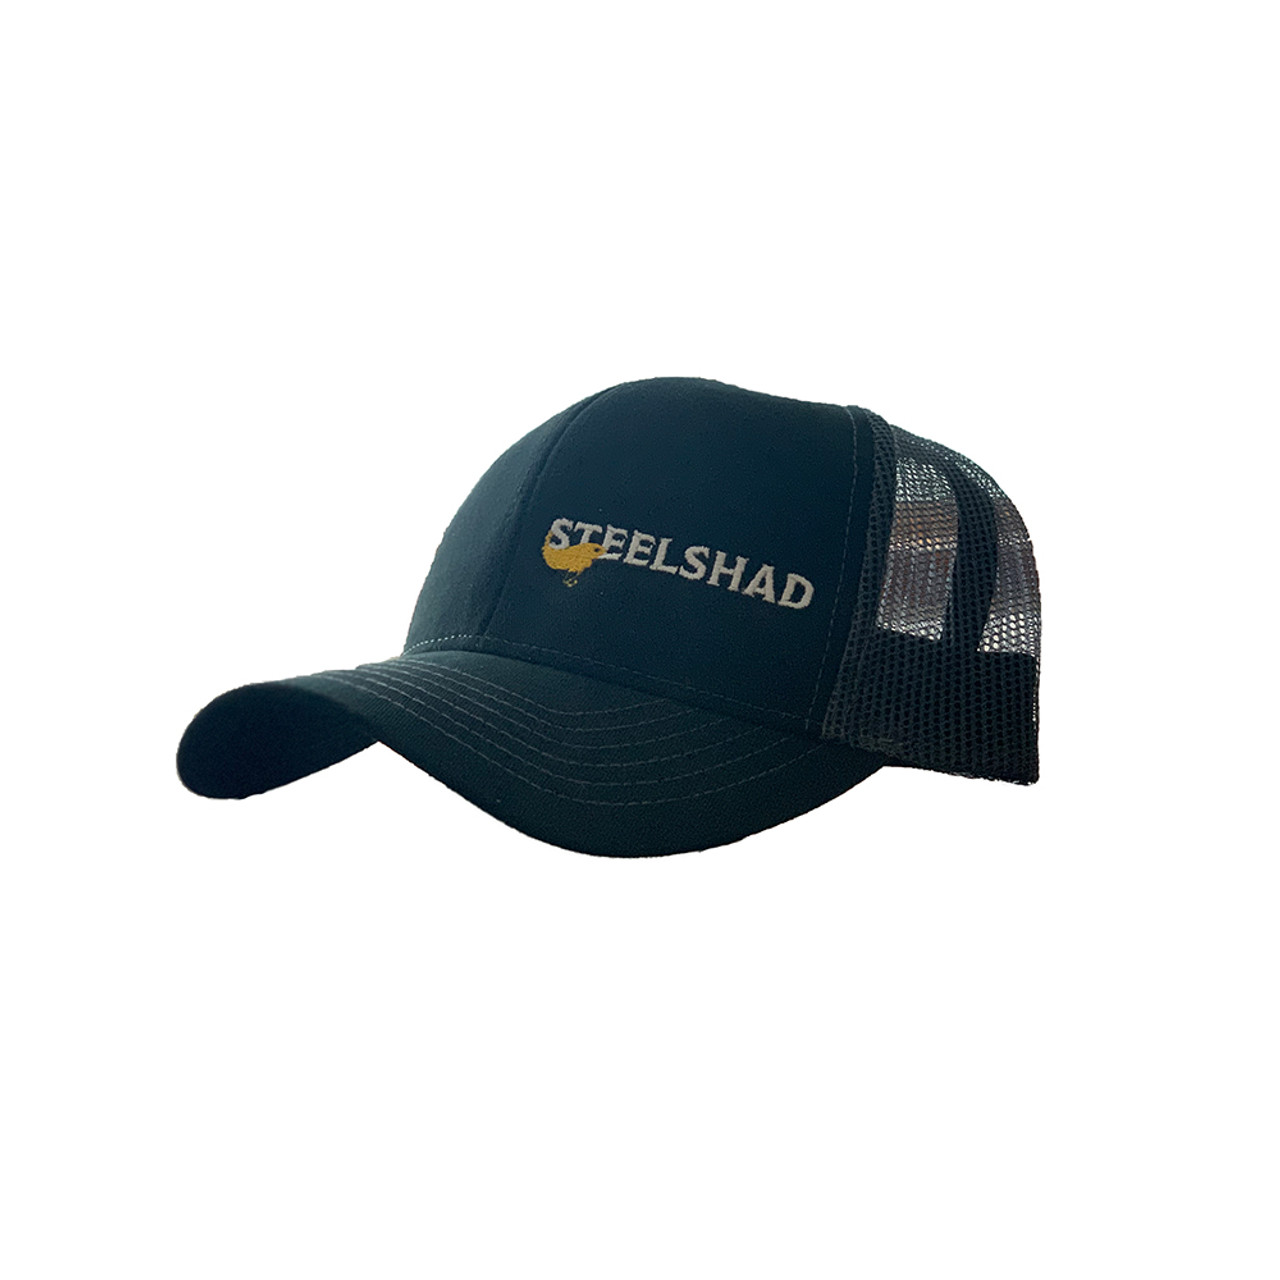 SteelShad Blackout Hat